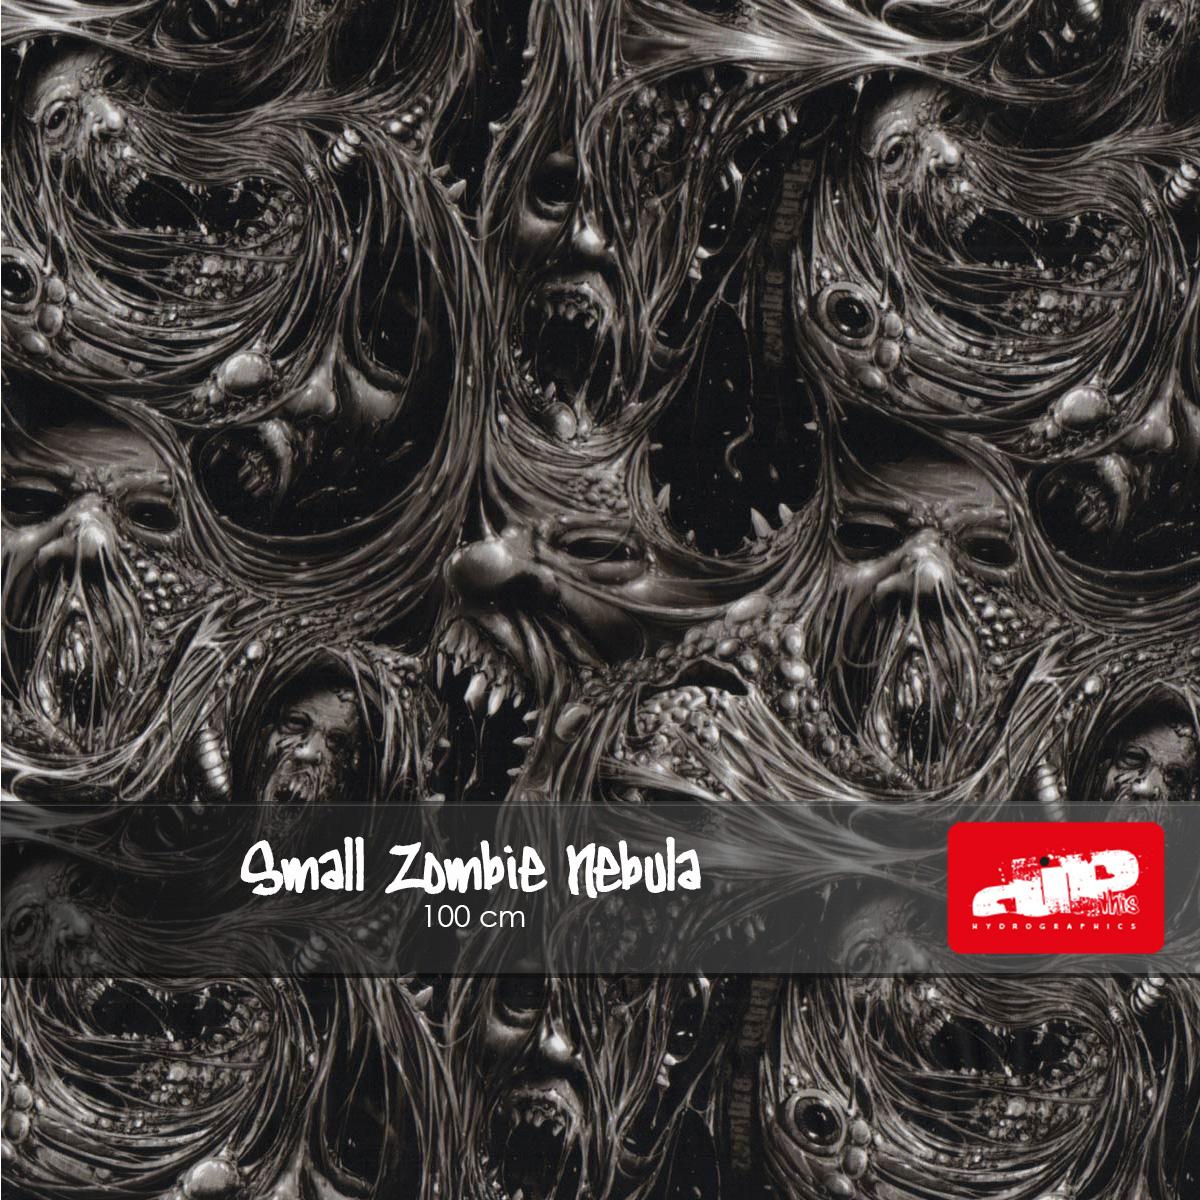 SMALL ZOMBIE NEBULA | Emerald Coatings